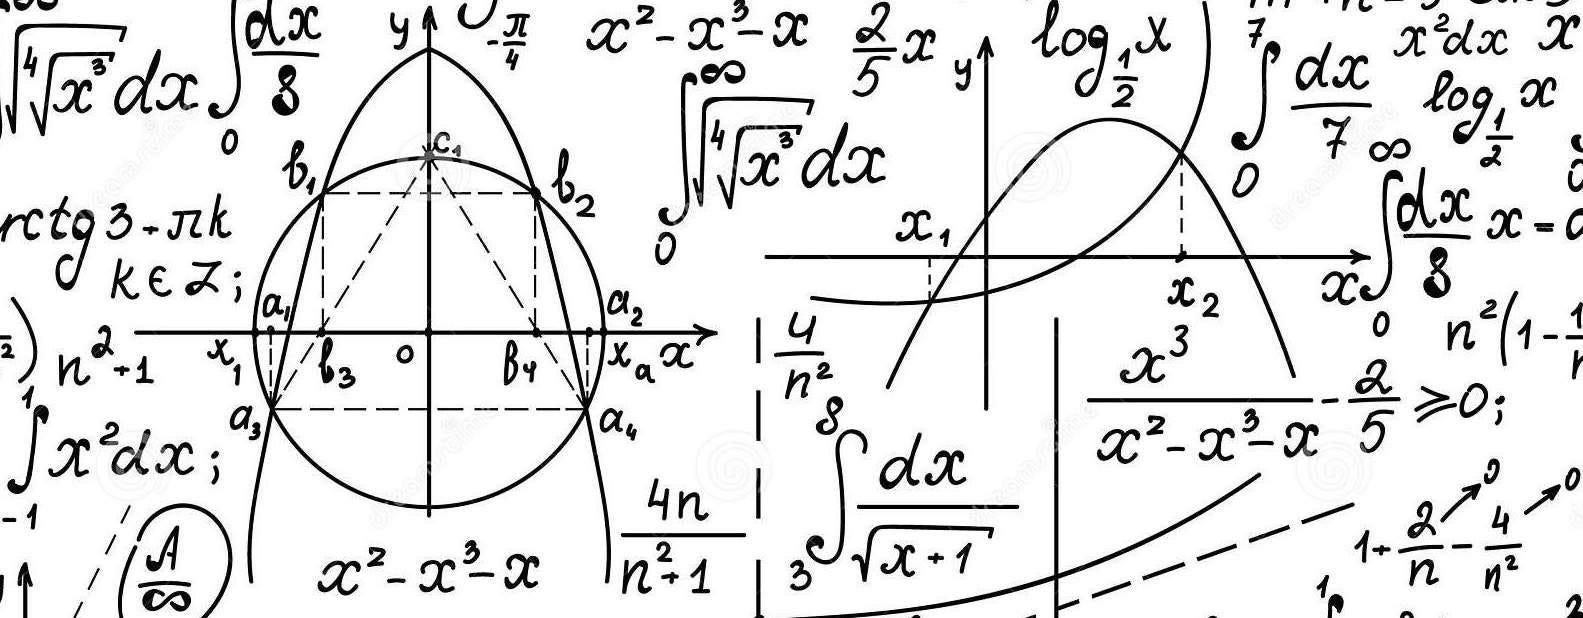 Converting Handwritten Math Symbols into Text Using Random